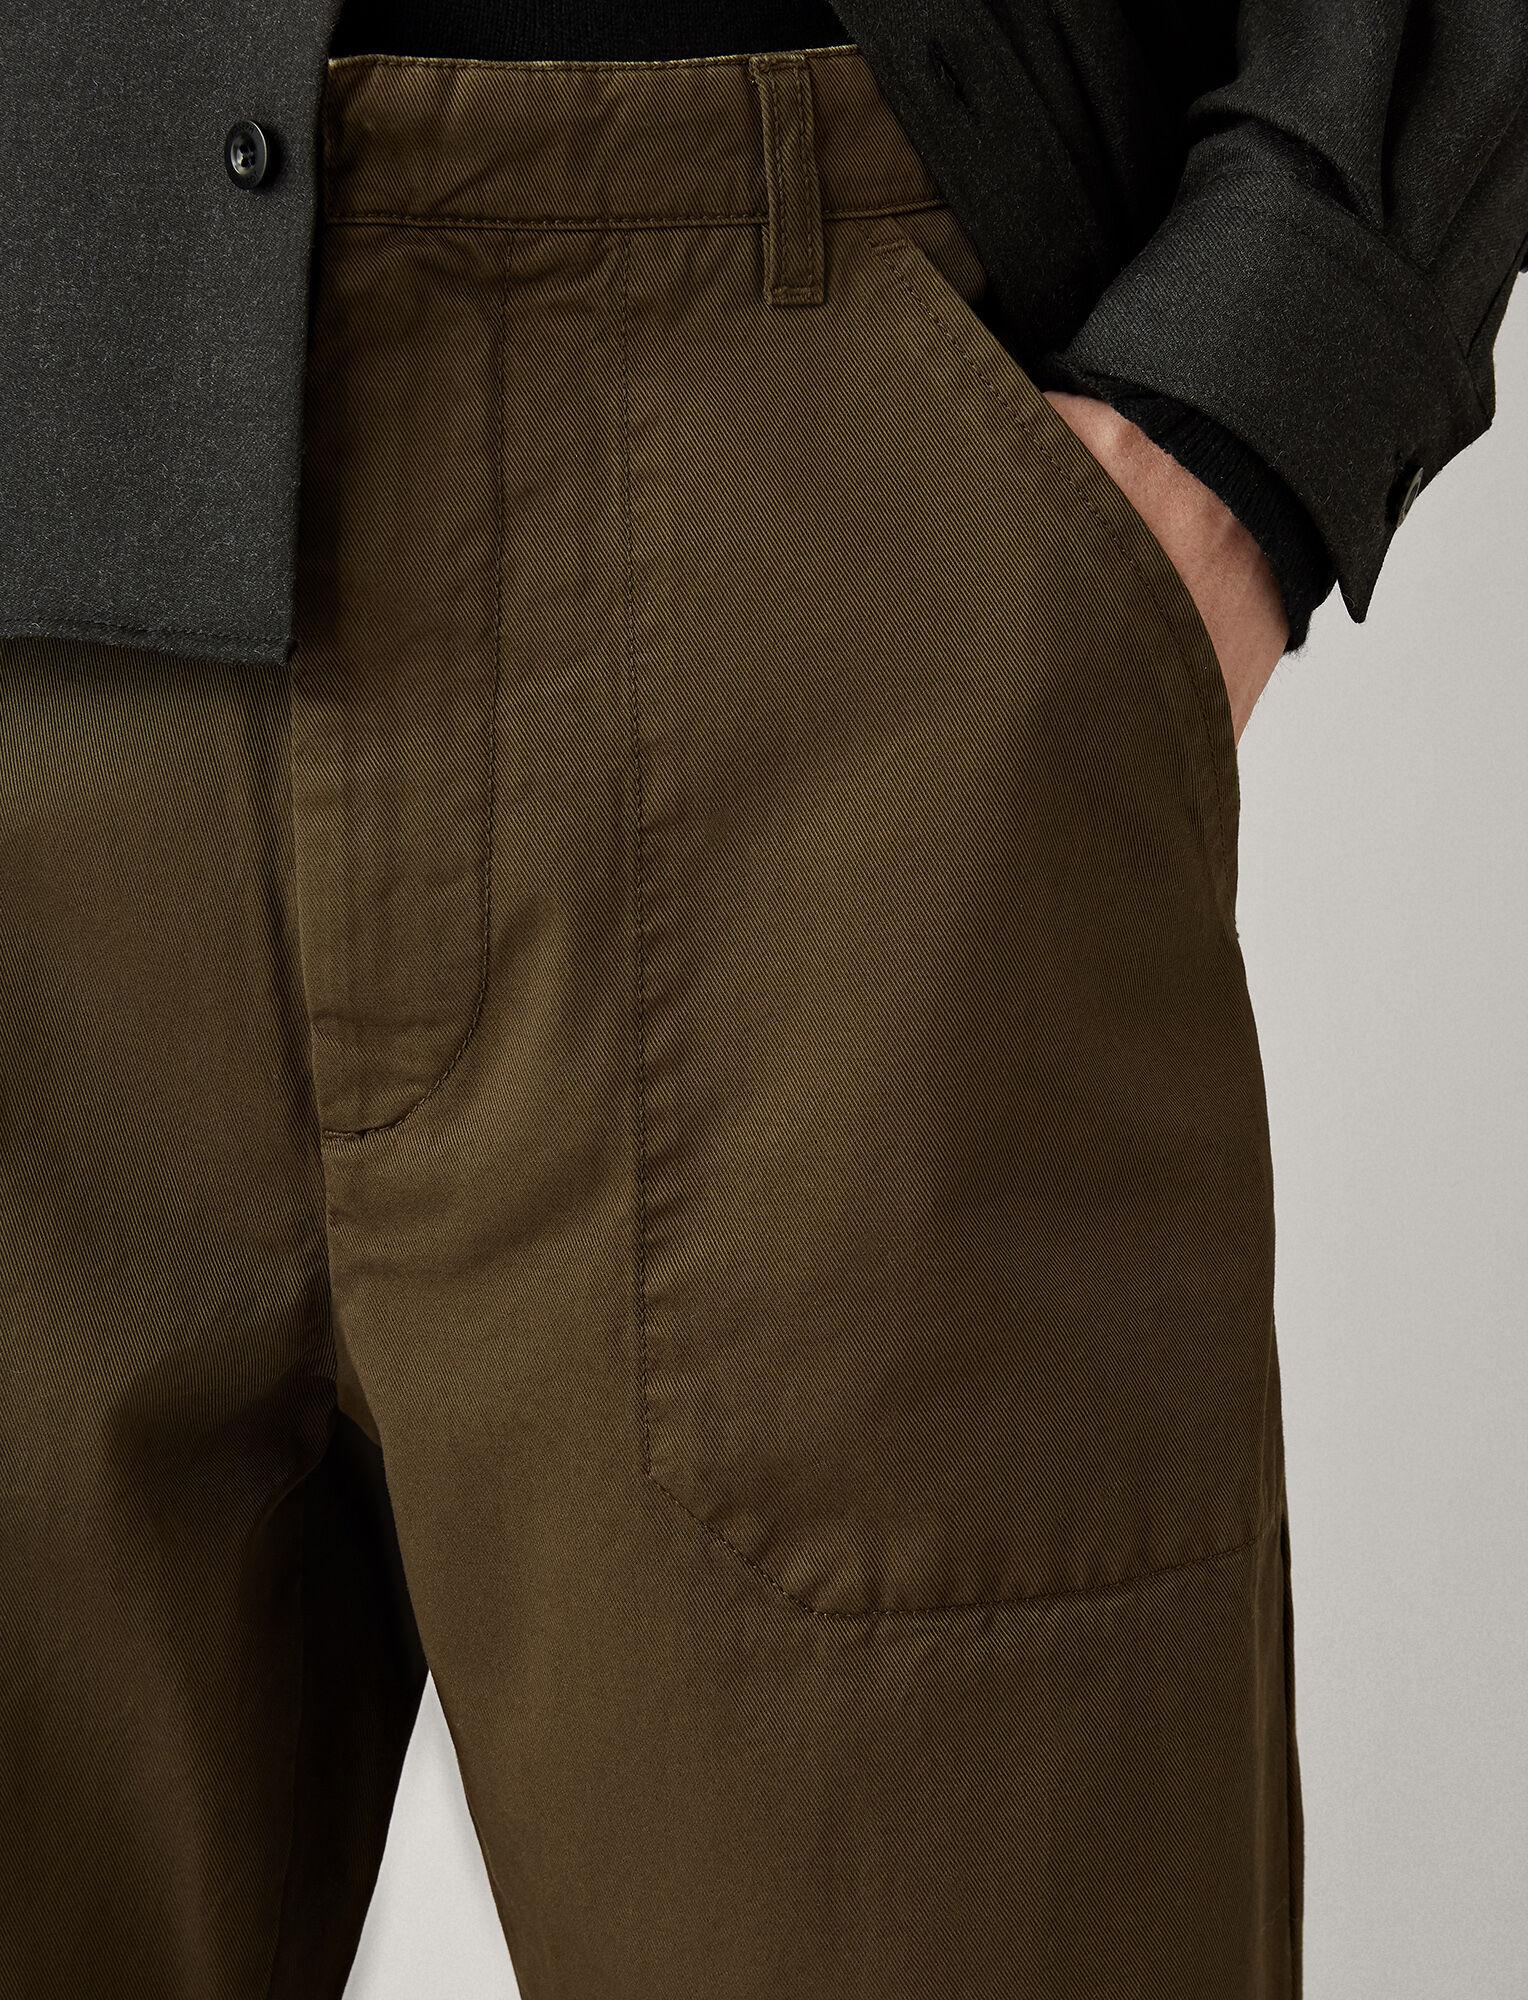 Joseph, Bridge Twill Cotton Dye Trousers, in MUD